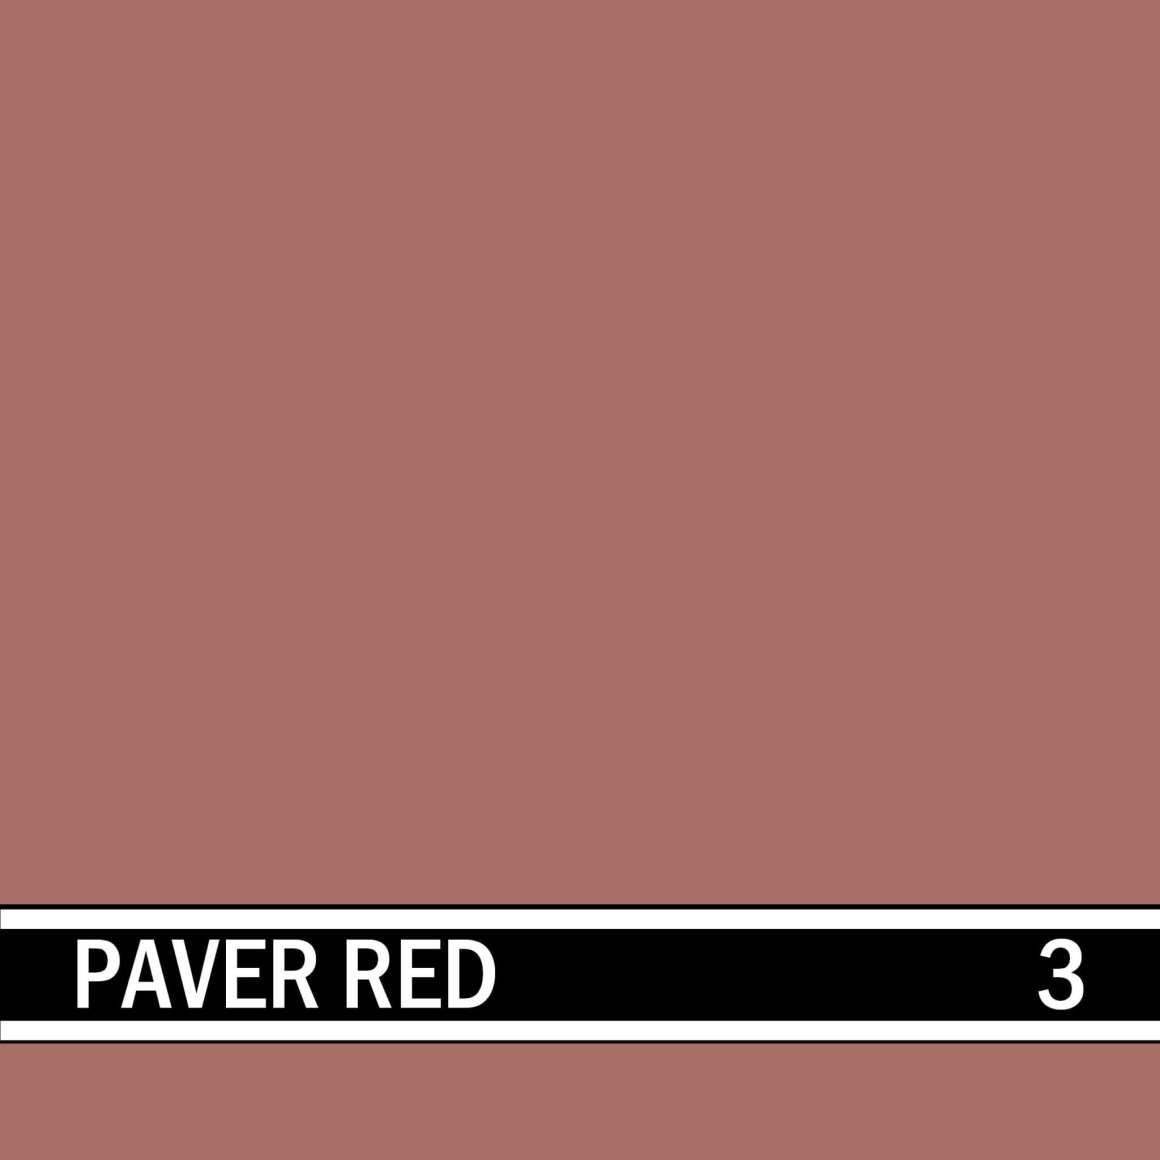 Paver Red integral concrete color for stamped concrete and decorative colored concrete